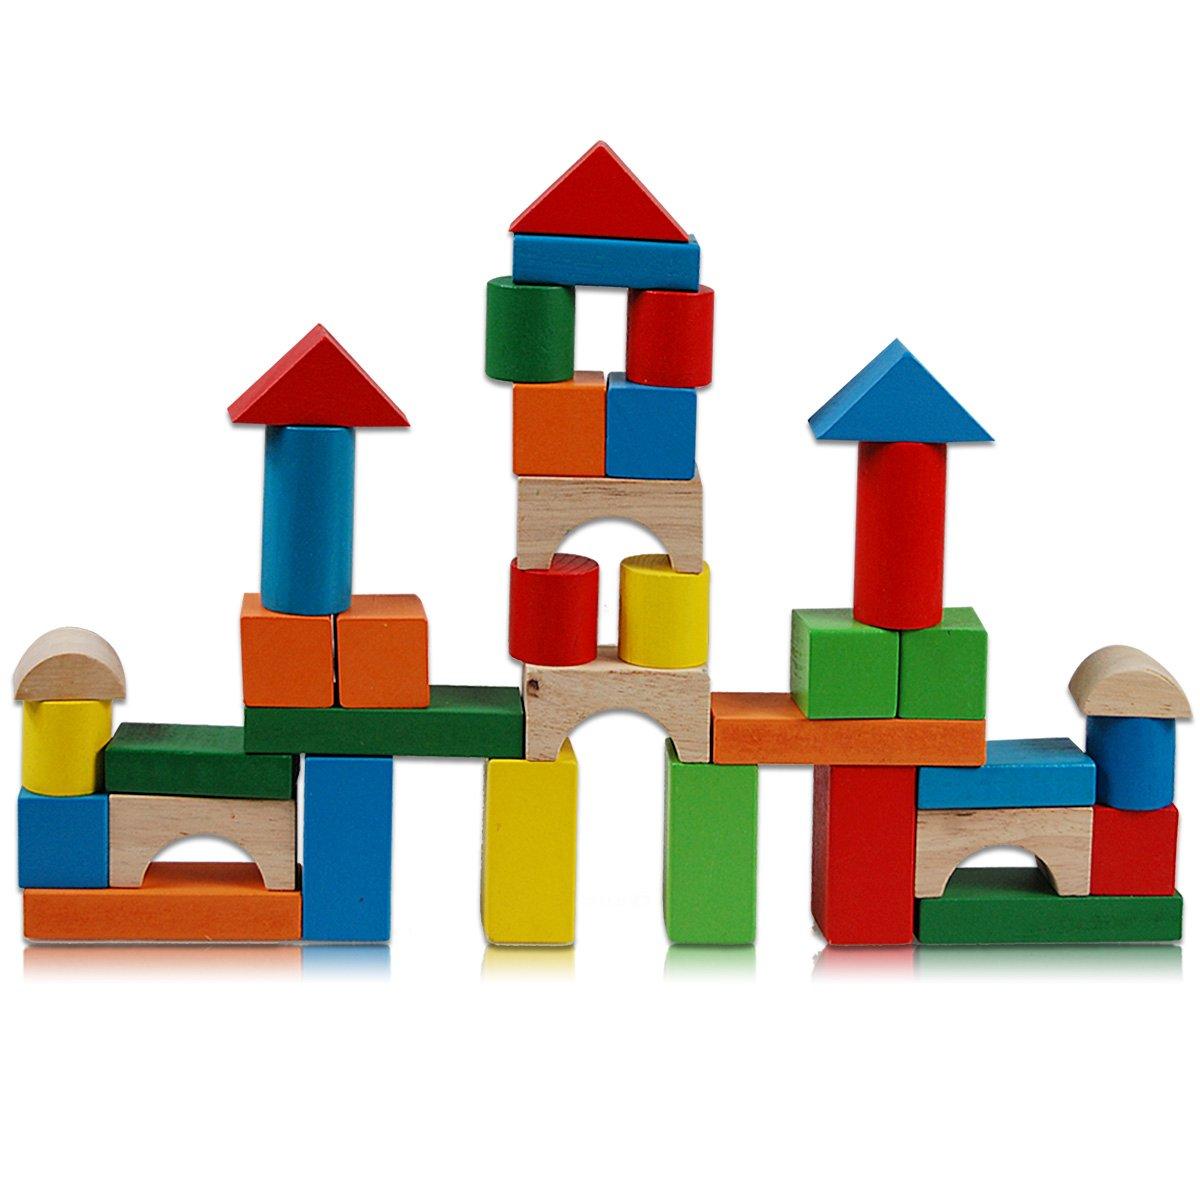 Free 3d Pile Of Bricks Wallpaper Building Blocks Pictures Free Download Best Building